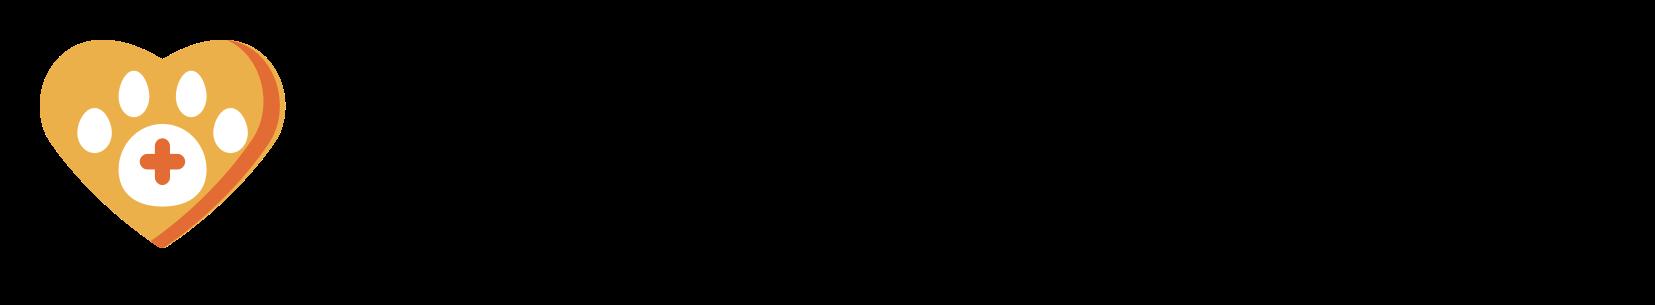 pawlicy advisor logo